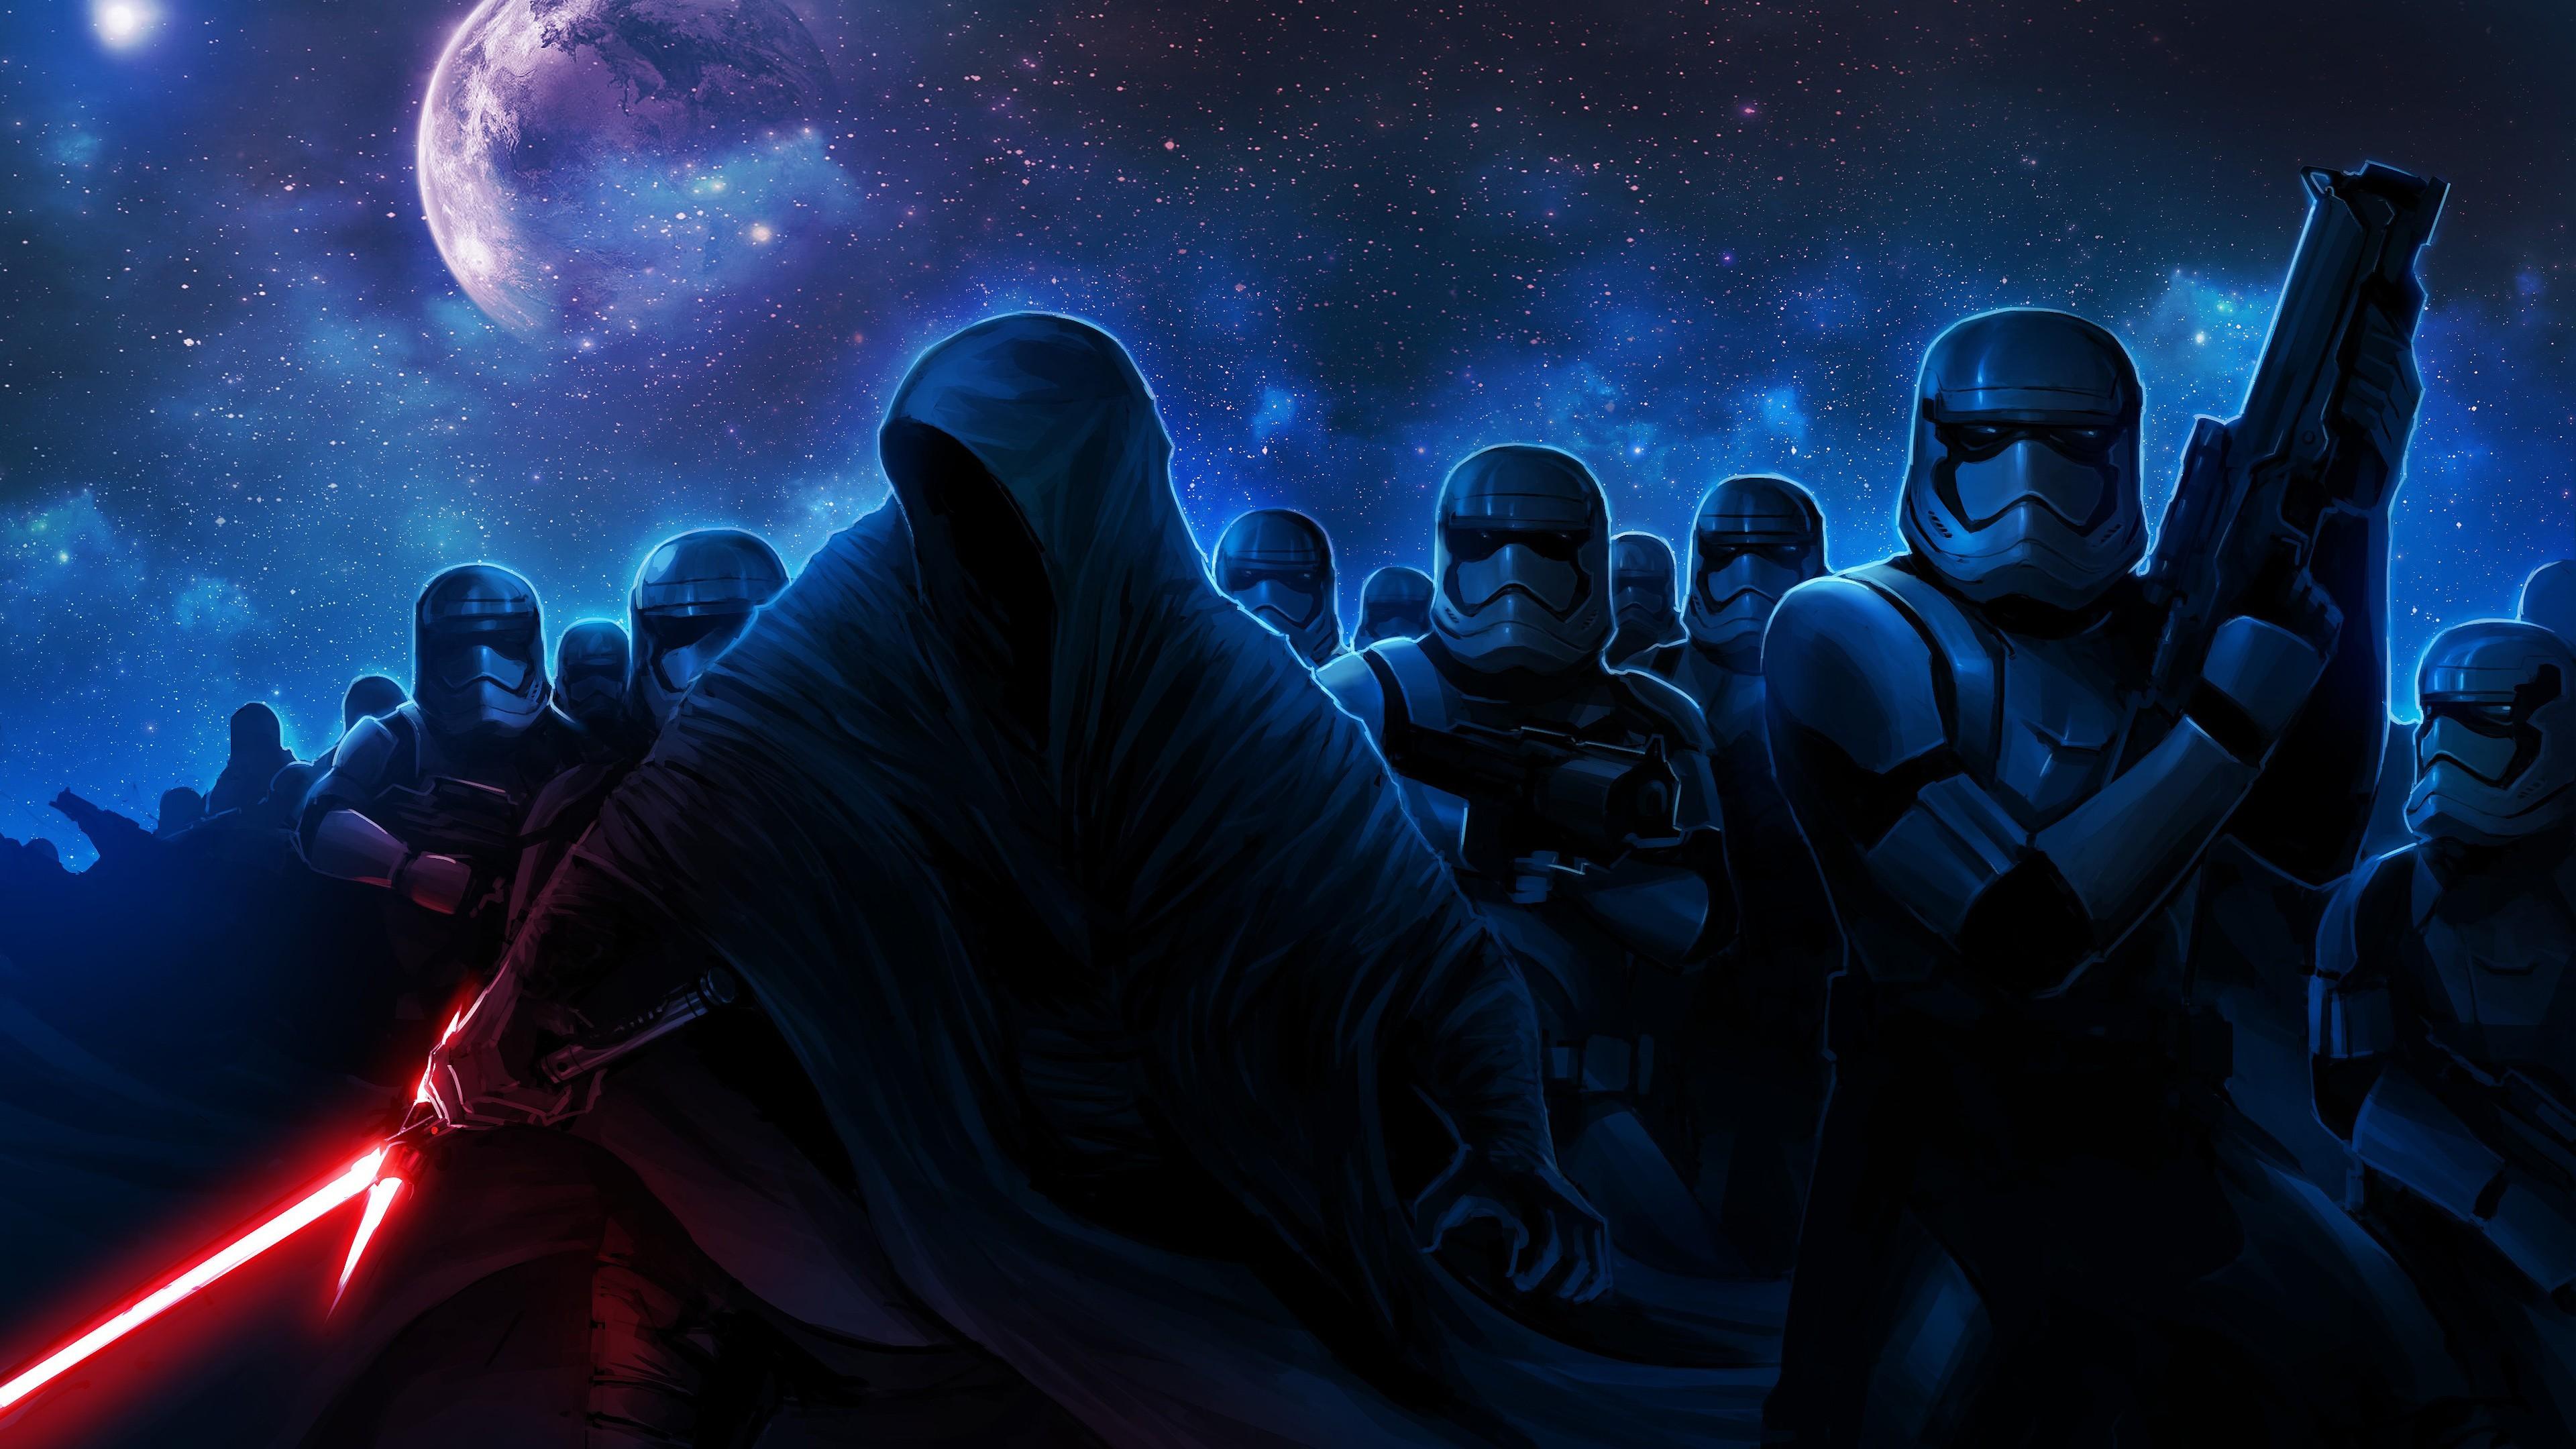 stormtroopers darth vader 1535966582 - Stormtroopers Darth Vader - games wallpapers, darth vader wallpapers